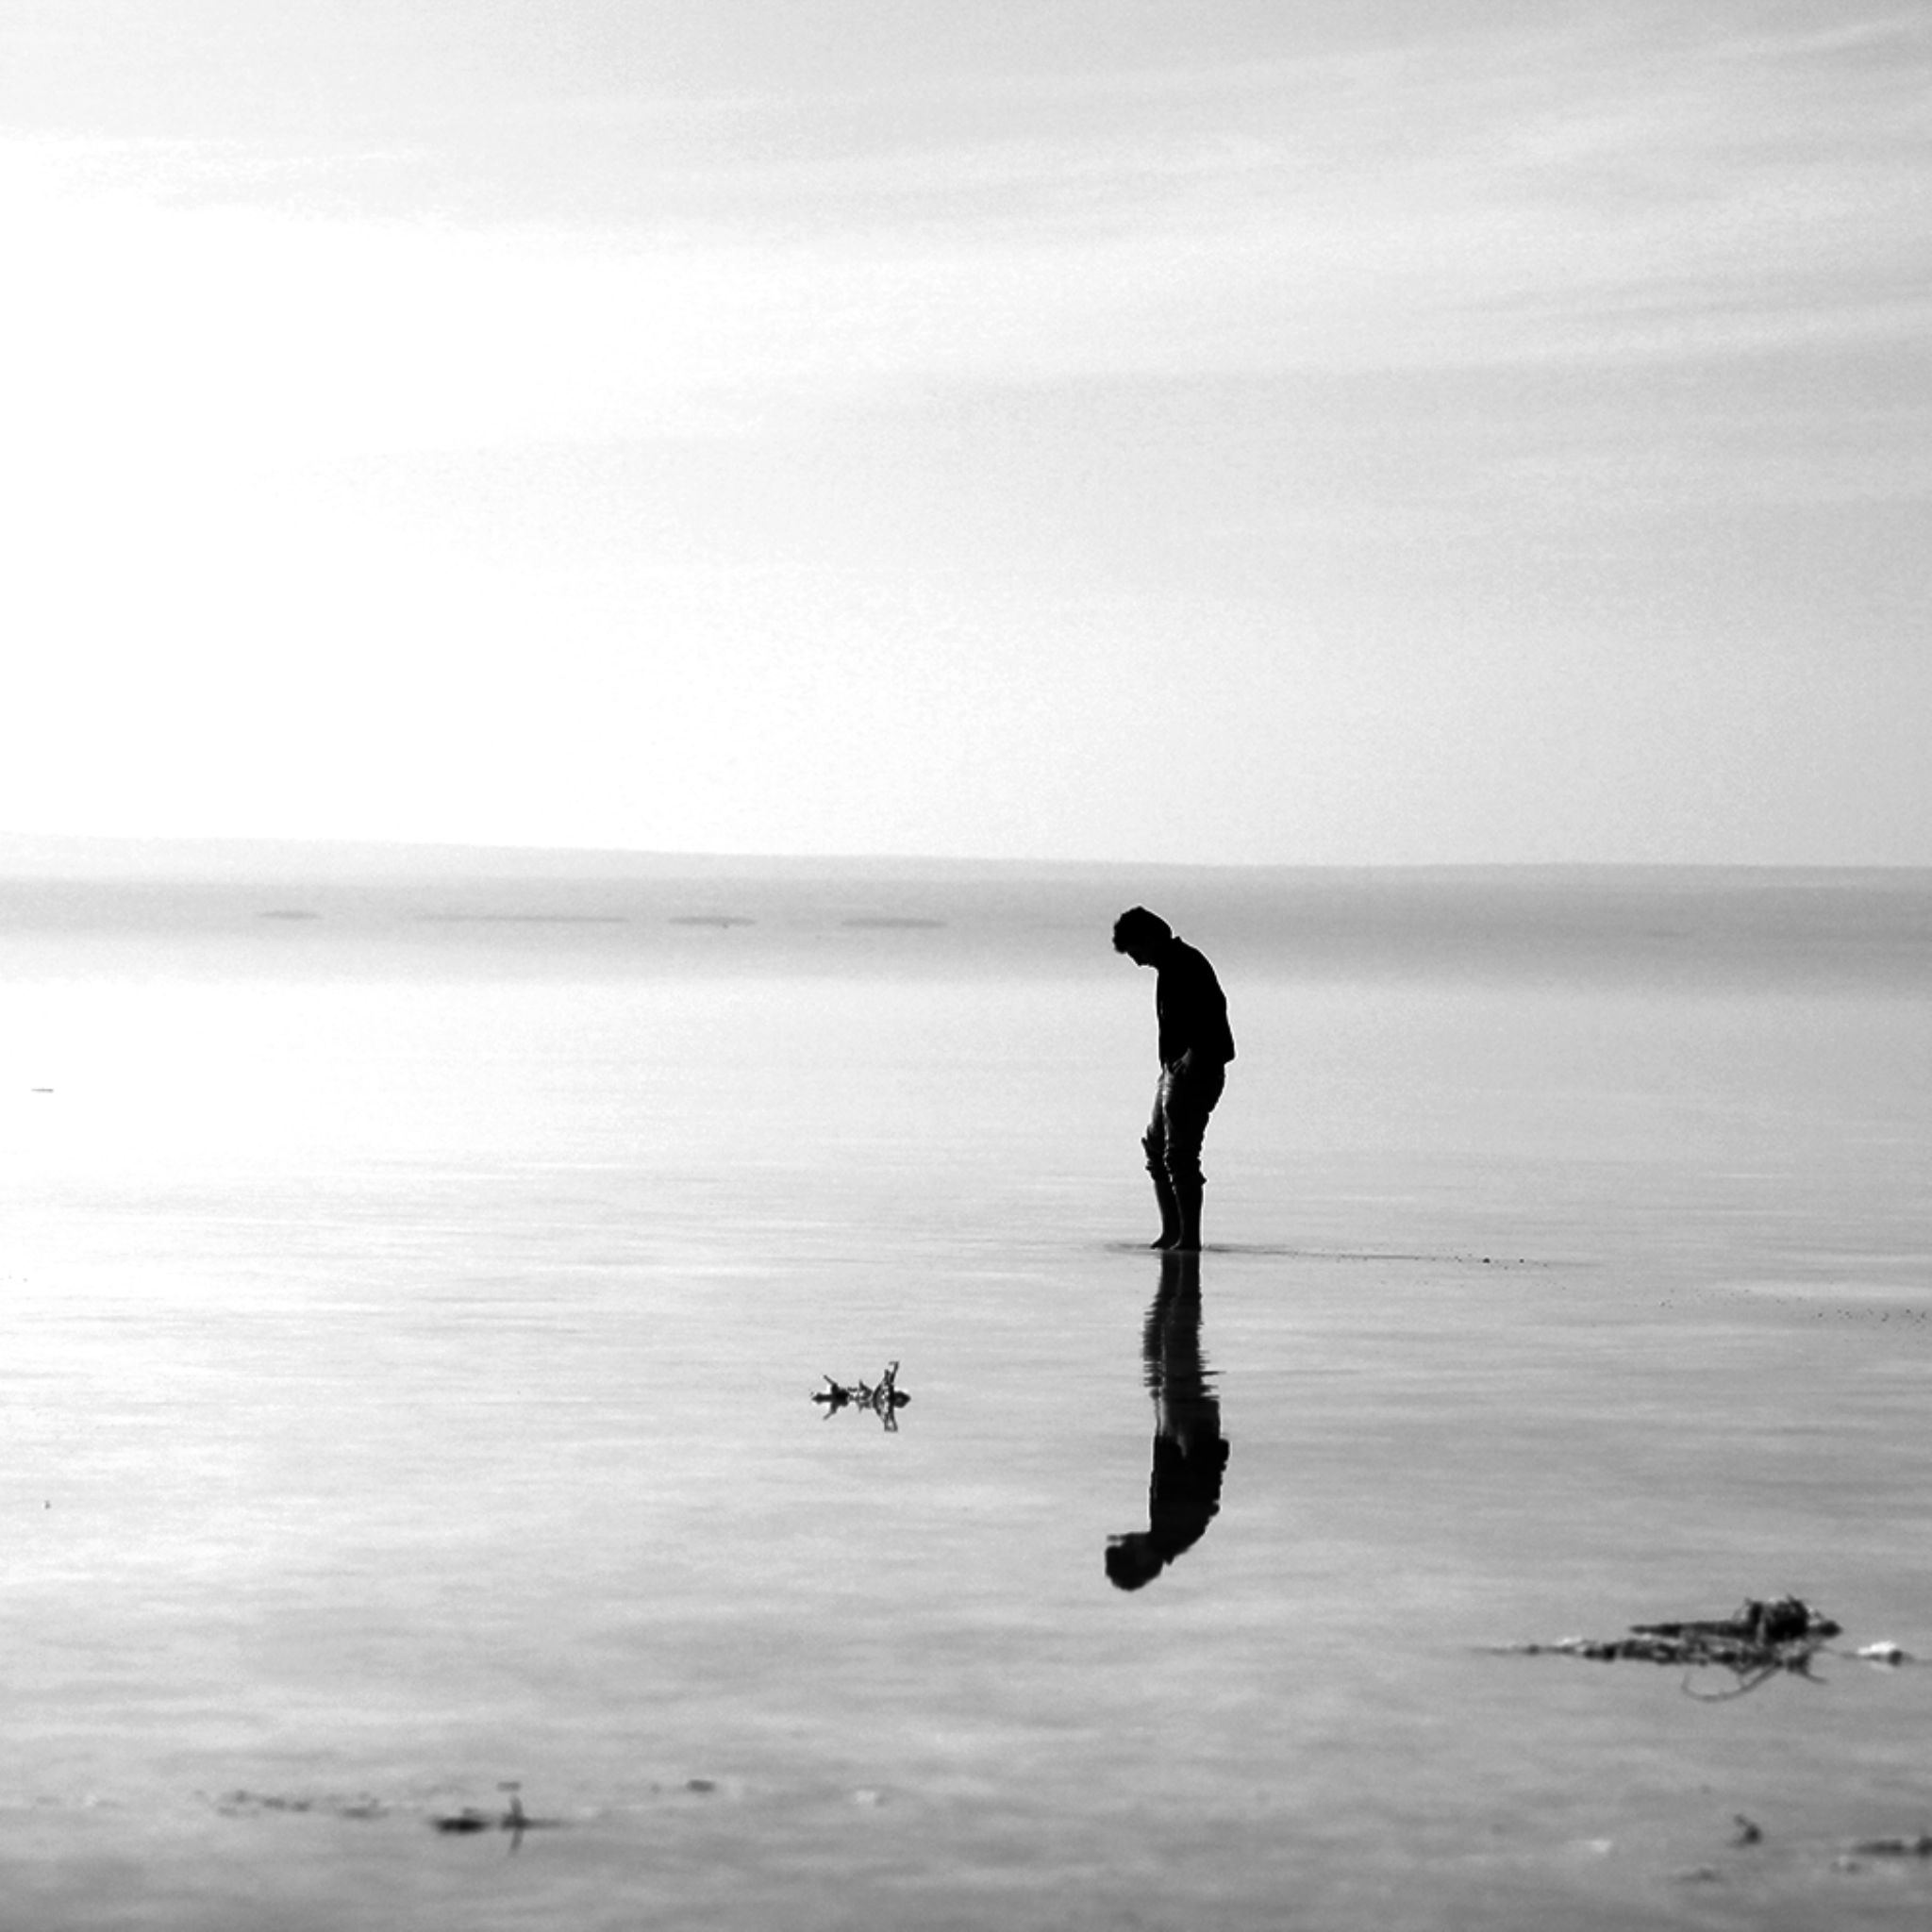 All alone by boranfot2